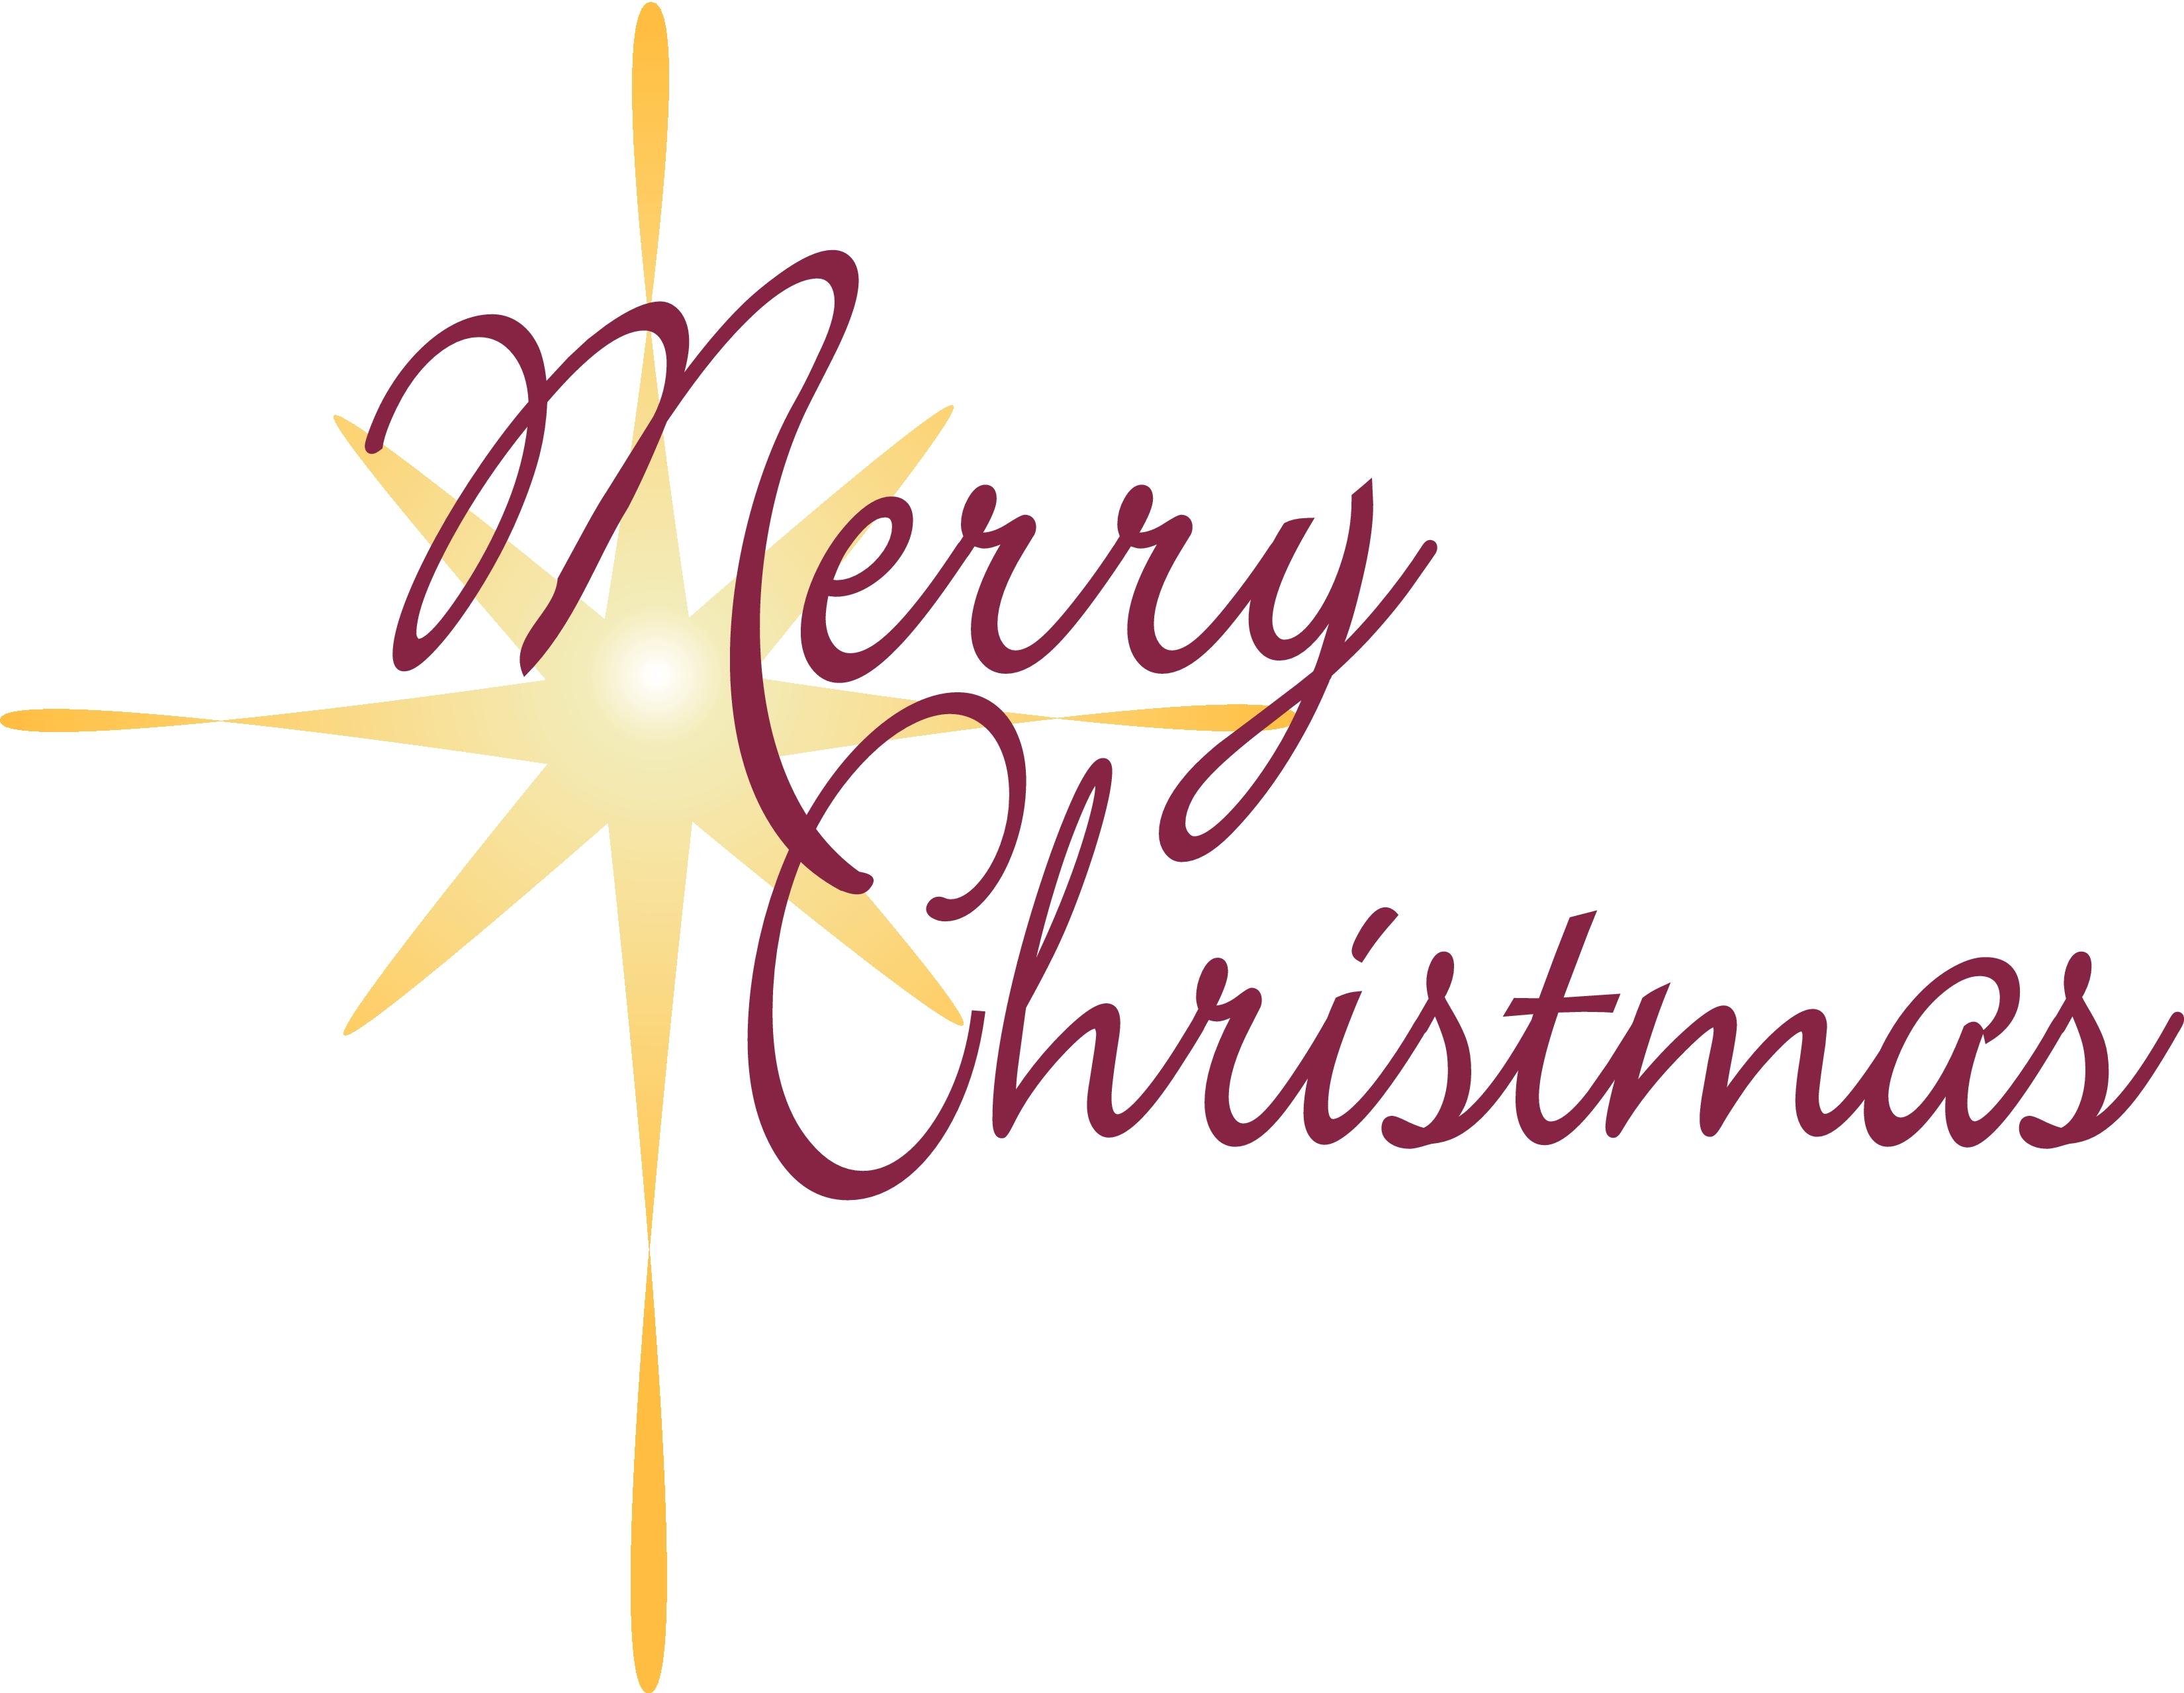 Free christian clipart for christmas banner black and white Christian Christmas Word Clip Art free image banner black and white